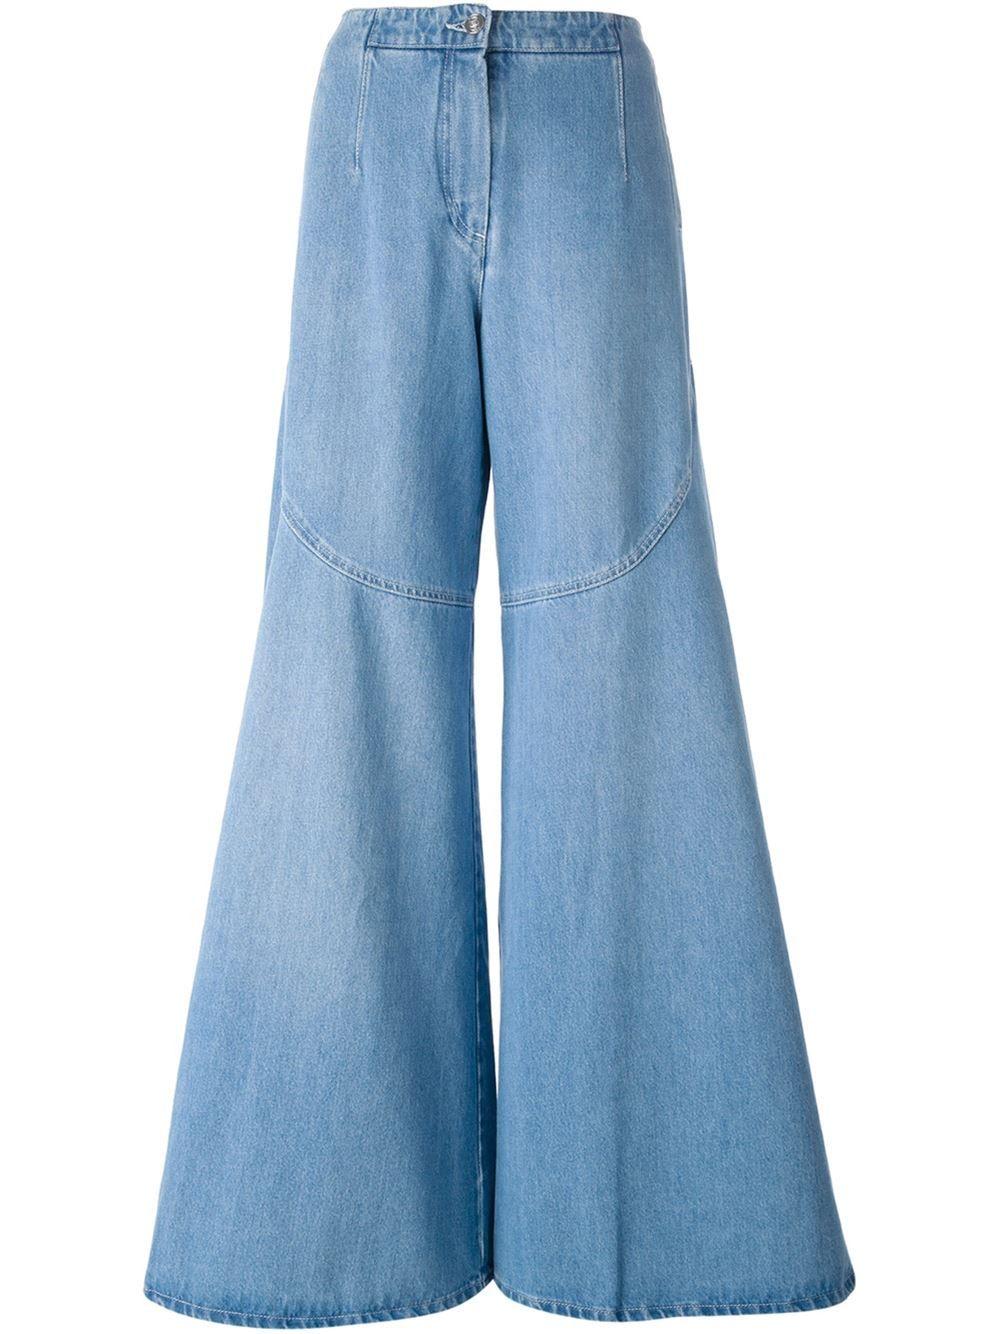 f0befa30 Kenzo Wide Leg Jeans - Dell'oglio - Farfetch.com | Farfetch - Resort ...